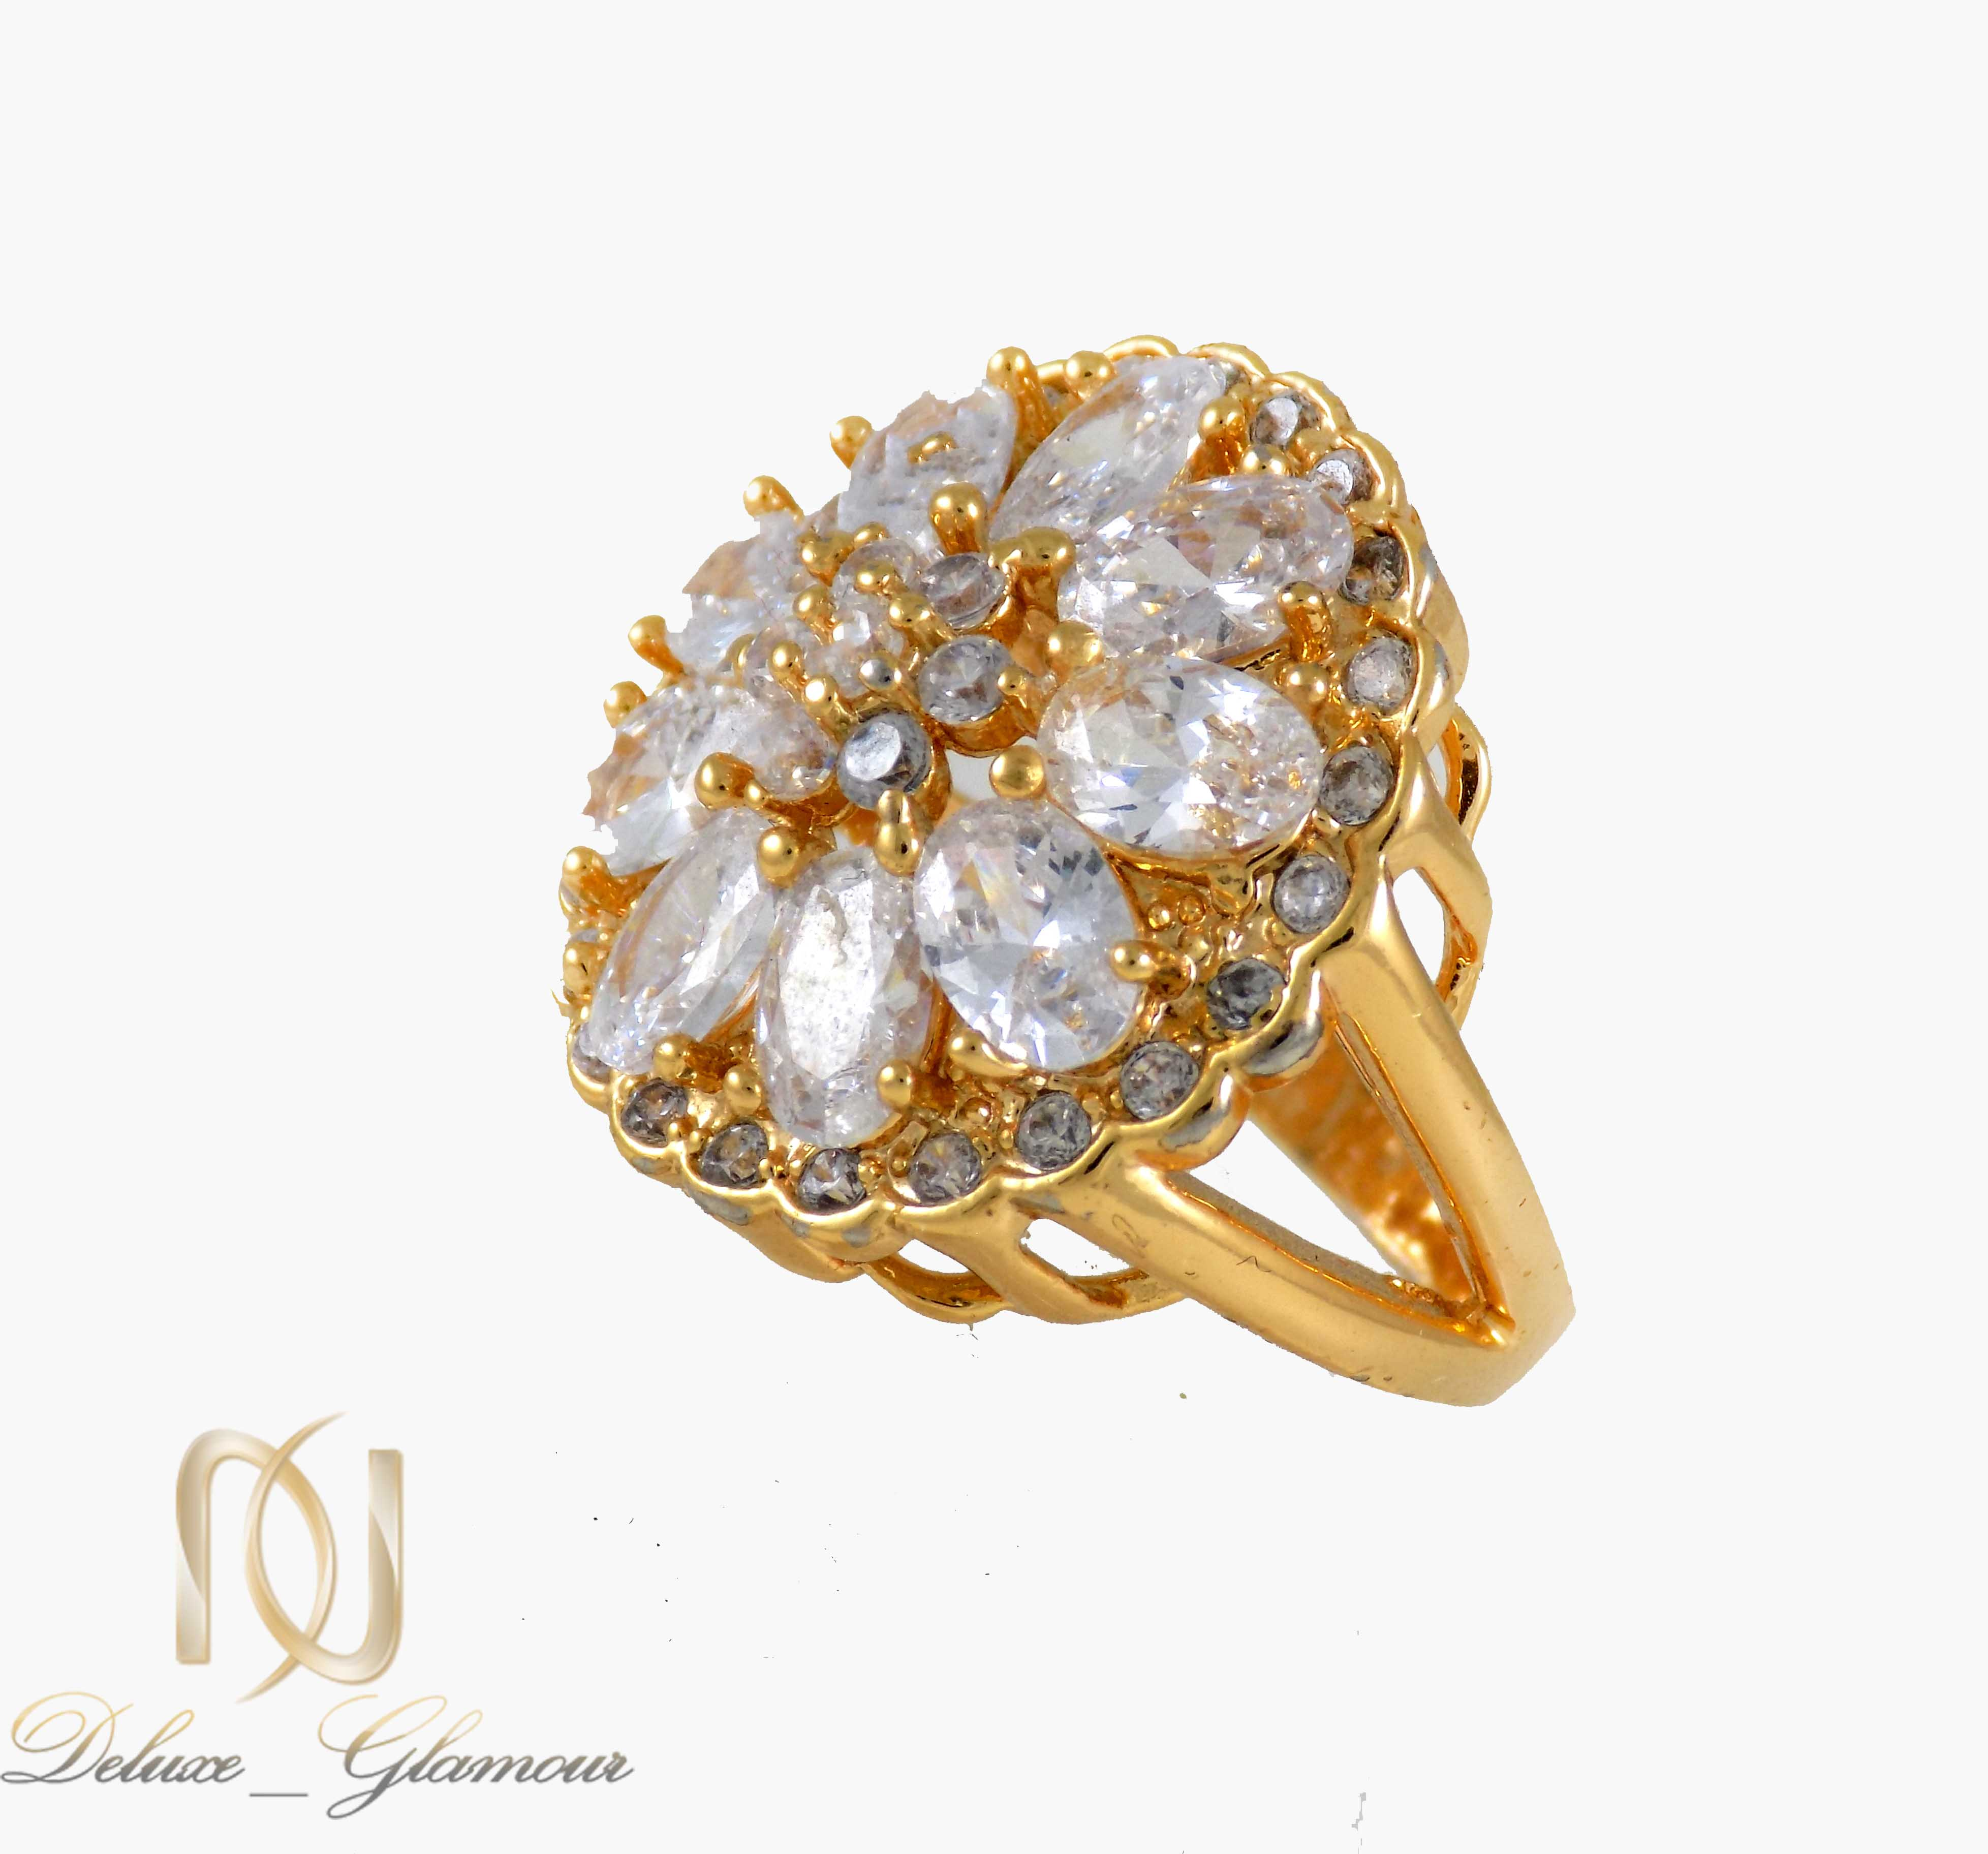 انگشتر زنانه استیل طلایی پرنگین rg-n312